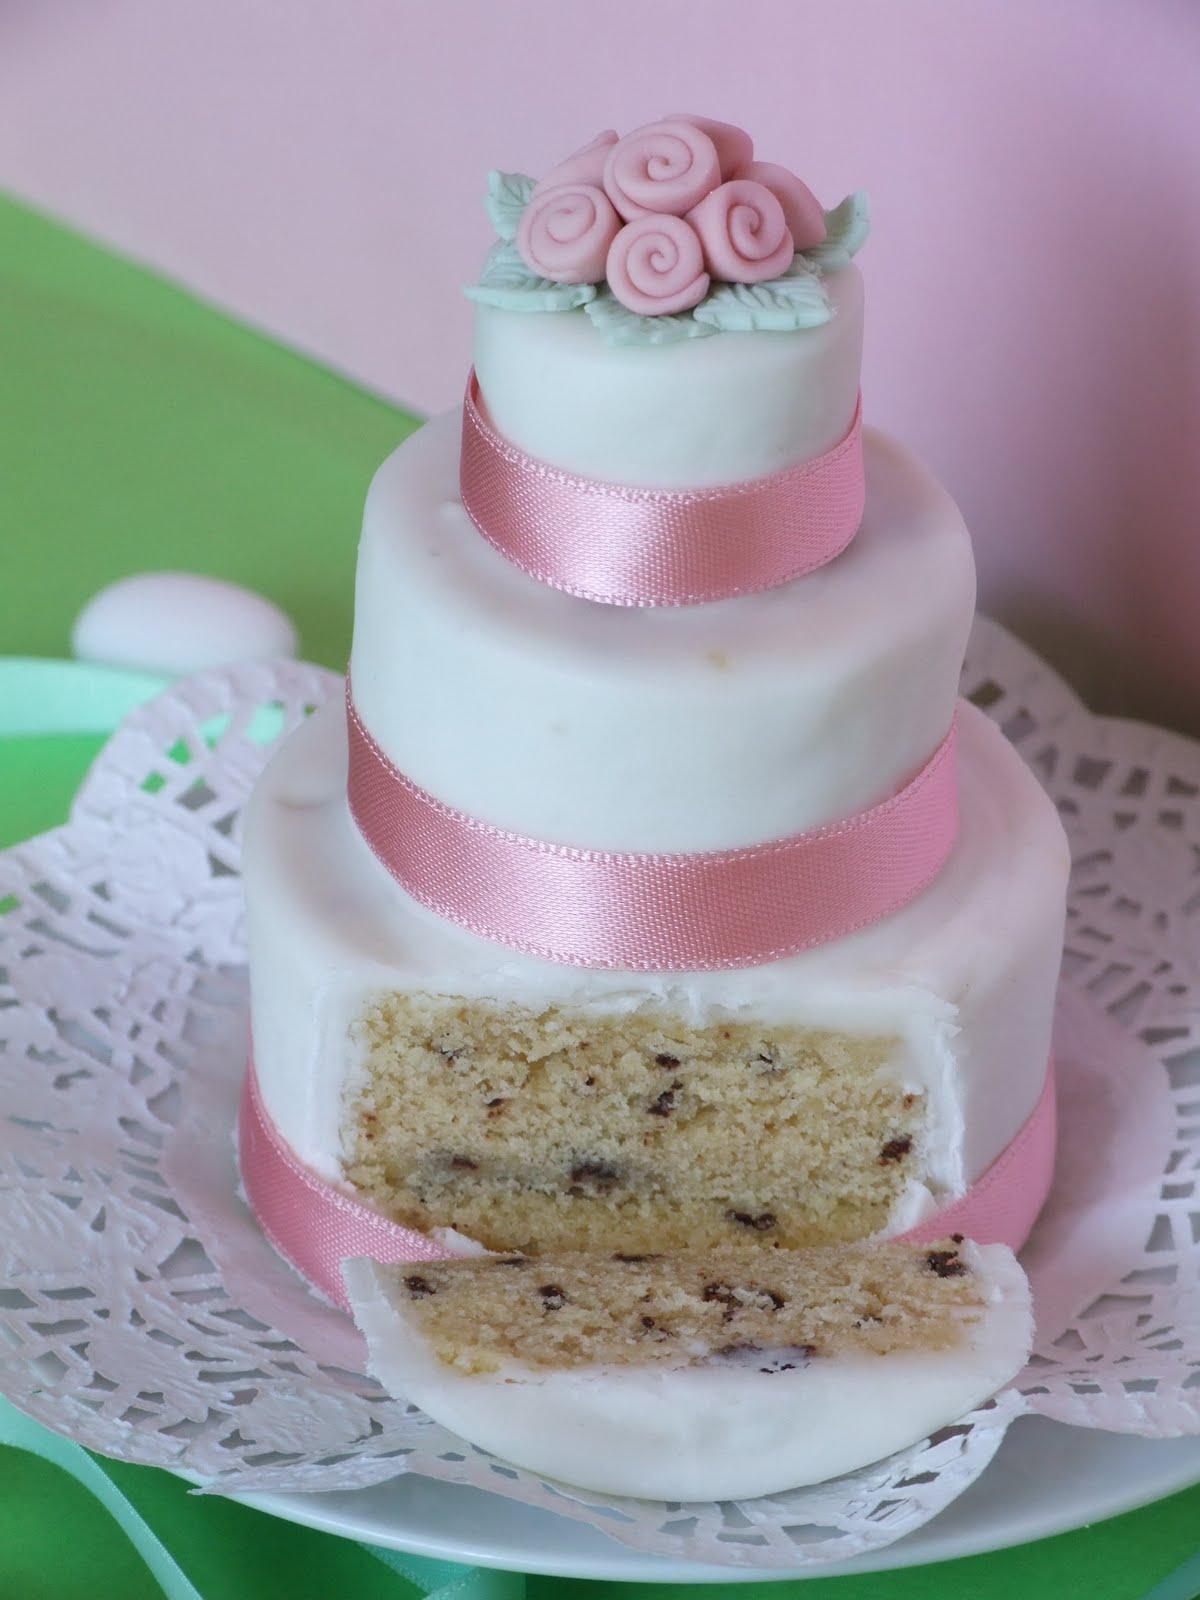 Chocolate Wedding Cakes Wales